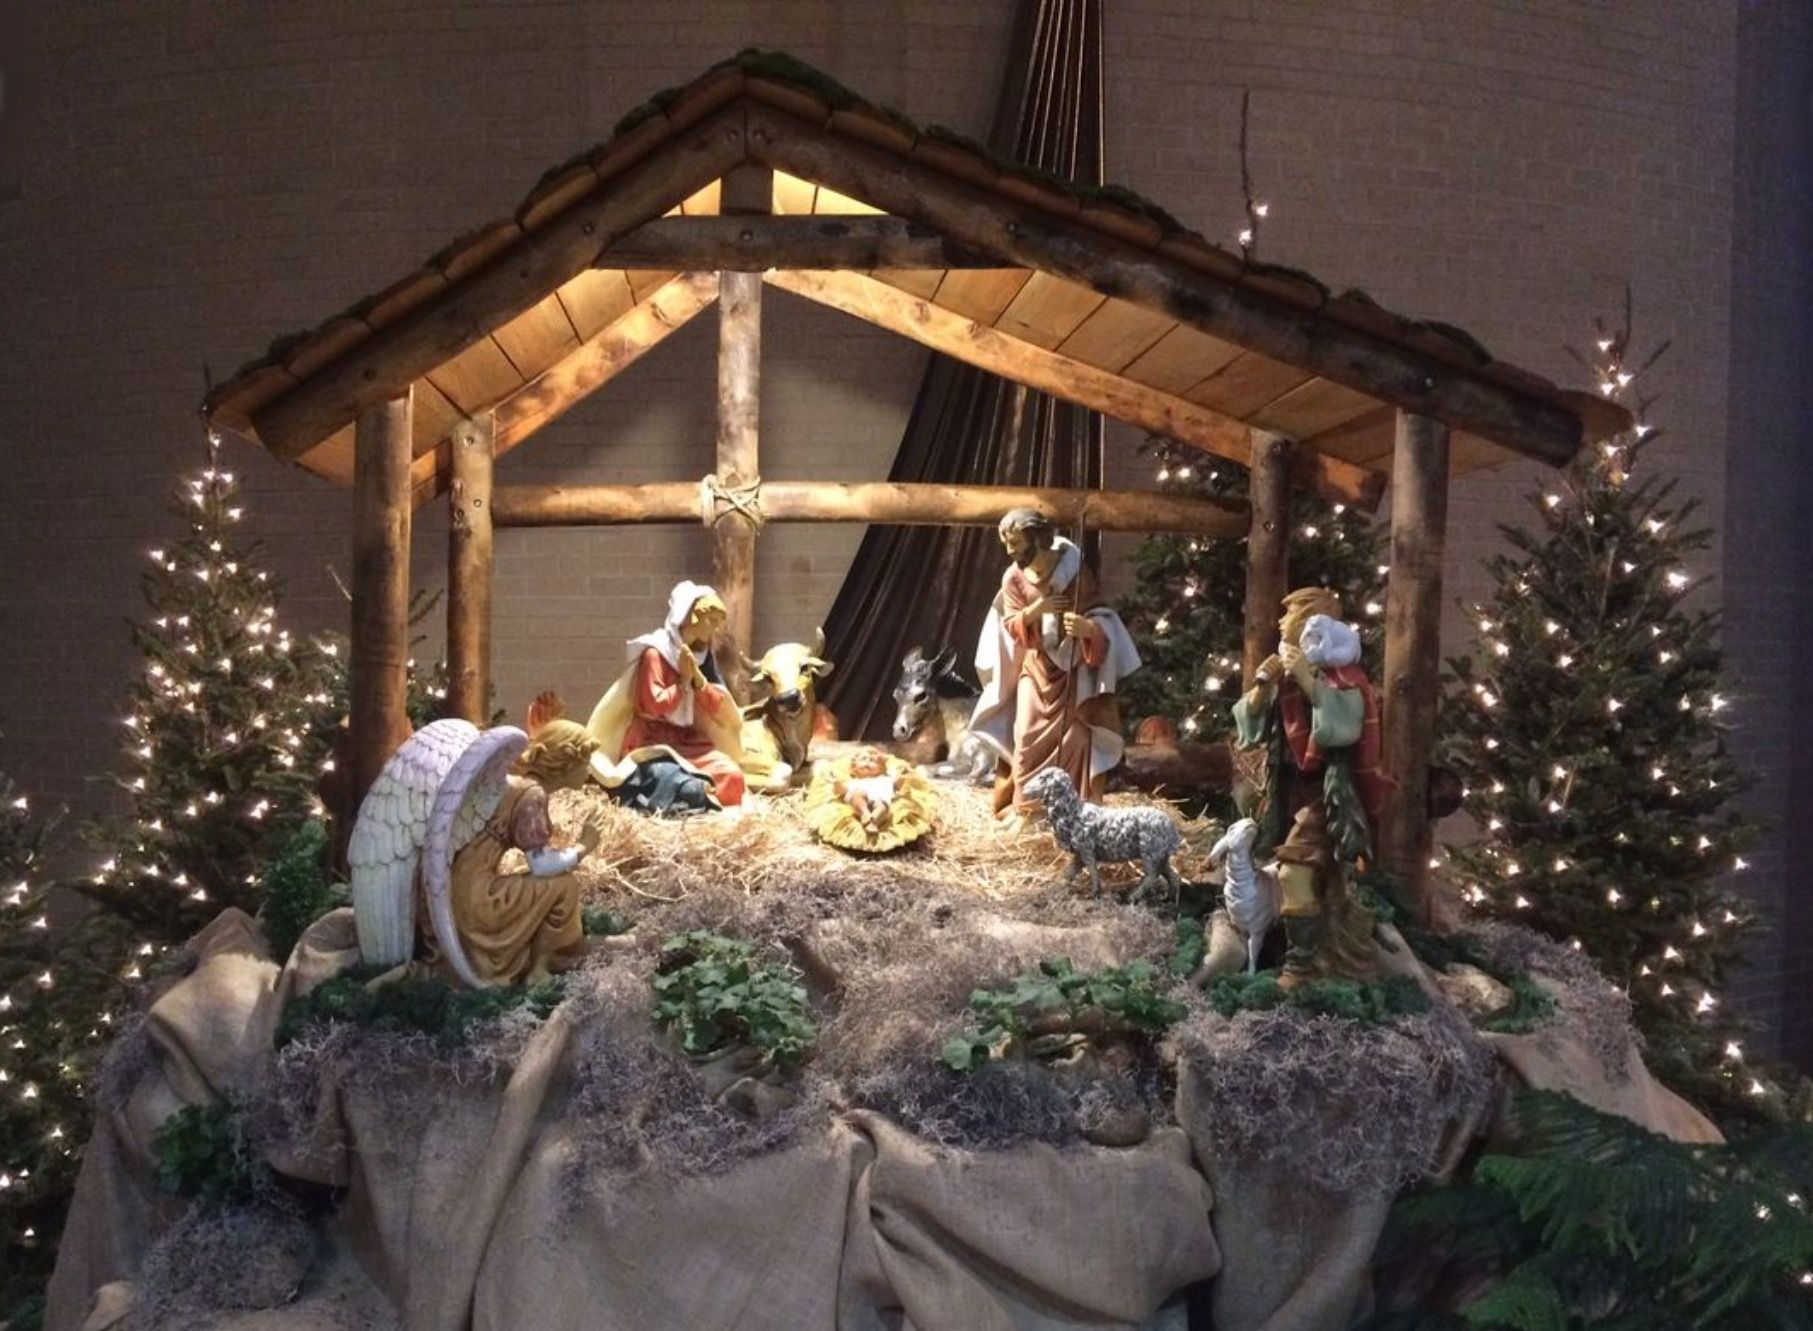 Nativity Scene Display Christmas Nativity Scene Display Nativity Scene Display Christmas Nativity Scene